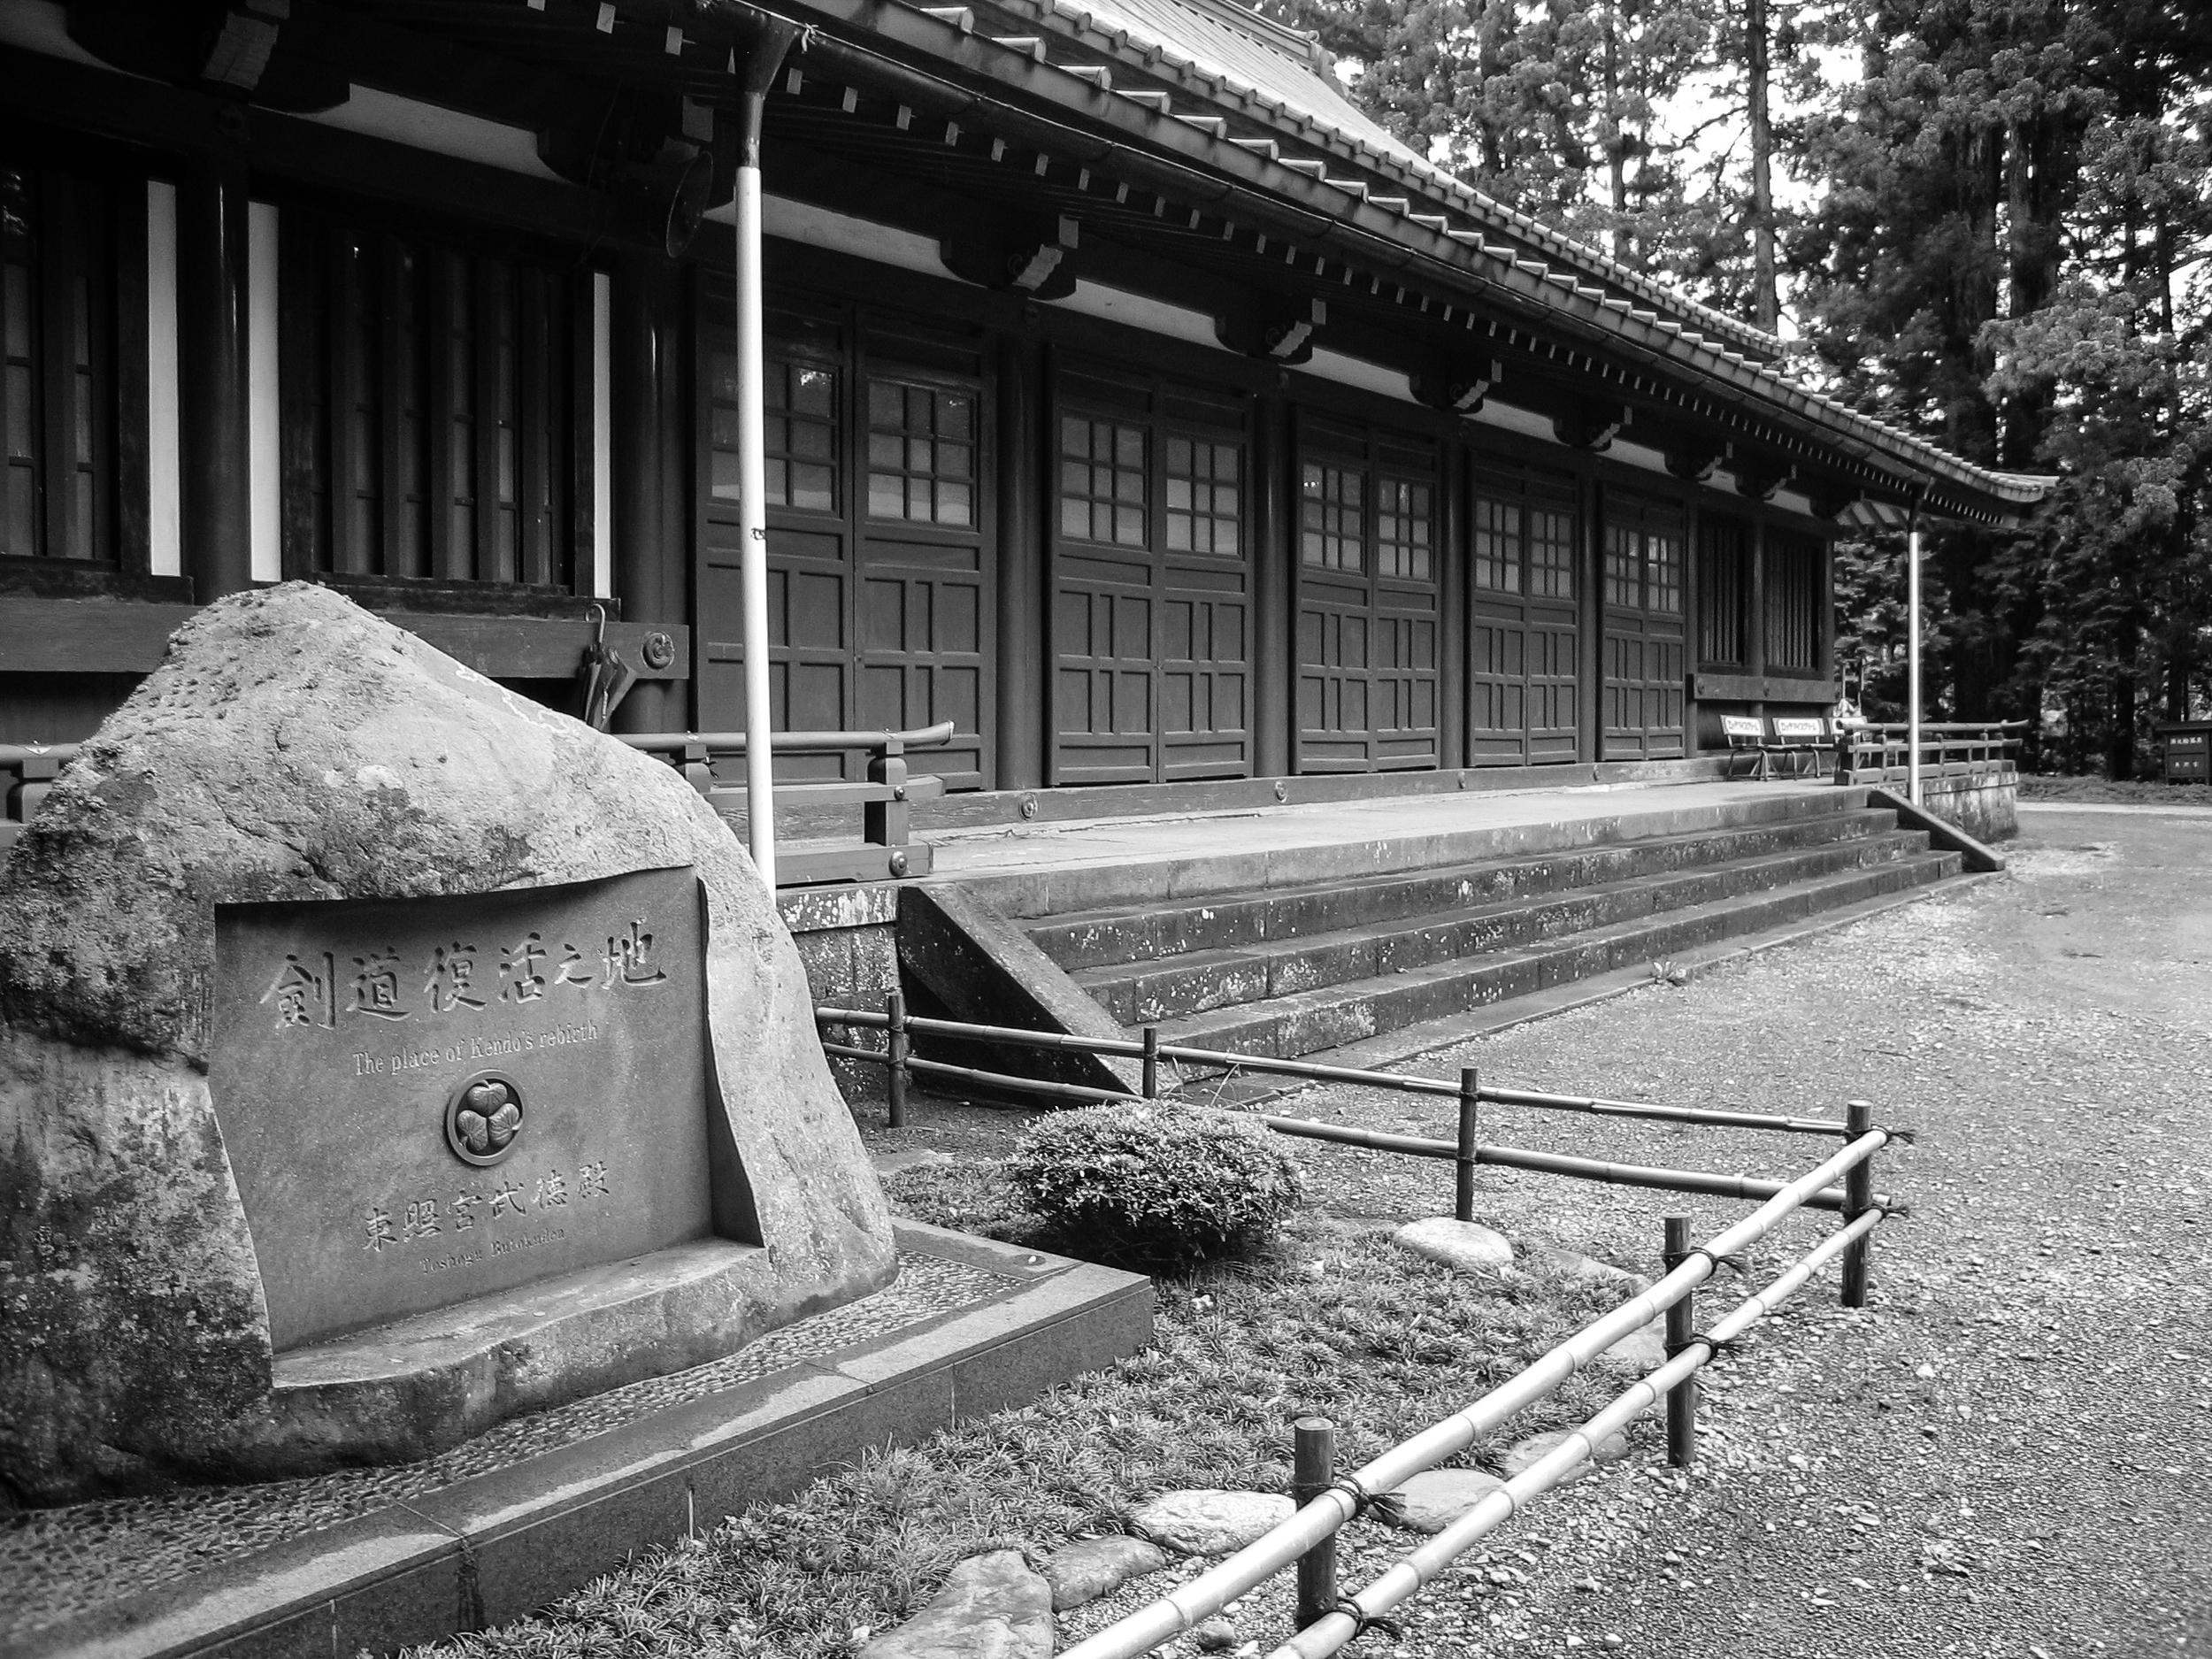 """The place of Kendo's rebirth."" Kendo (Japan's traditional sport of swordsmanship) hall at Nikkō Tōshō-gū Shinto Shrine."